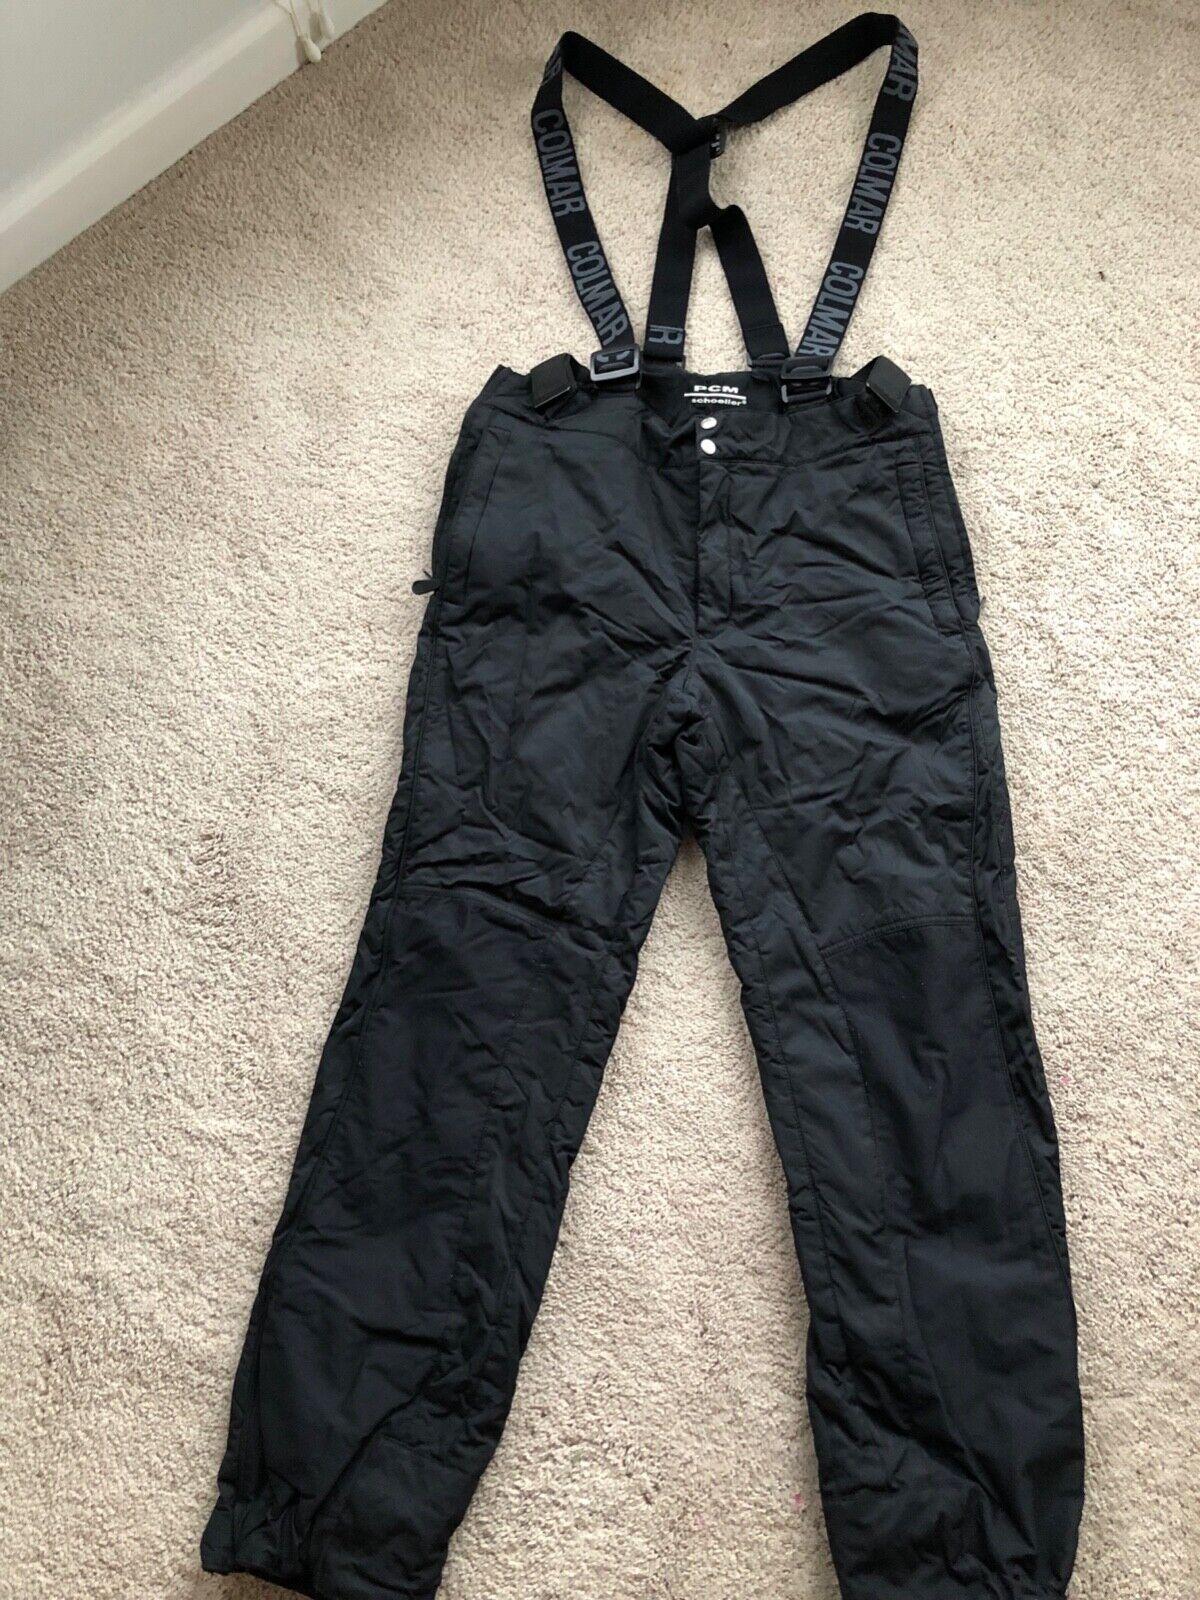 Colmar Ski pants schoeller-pcm sz 52